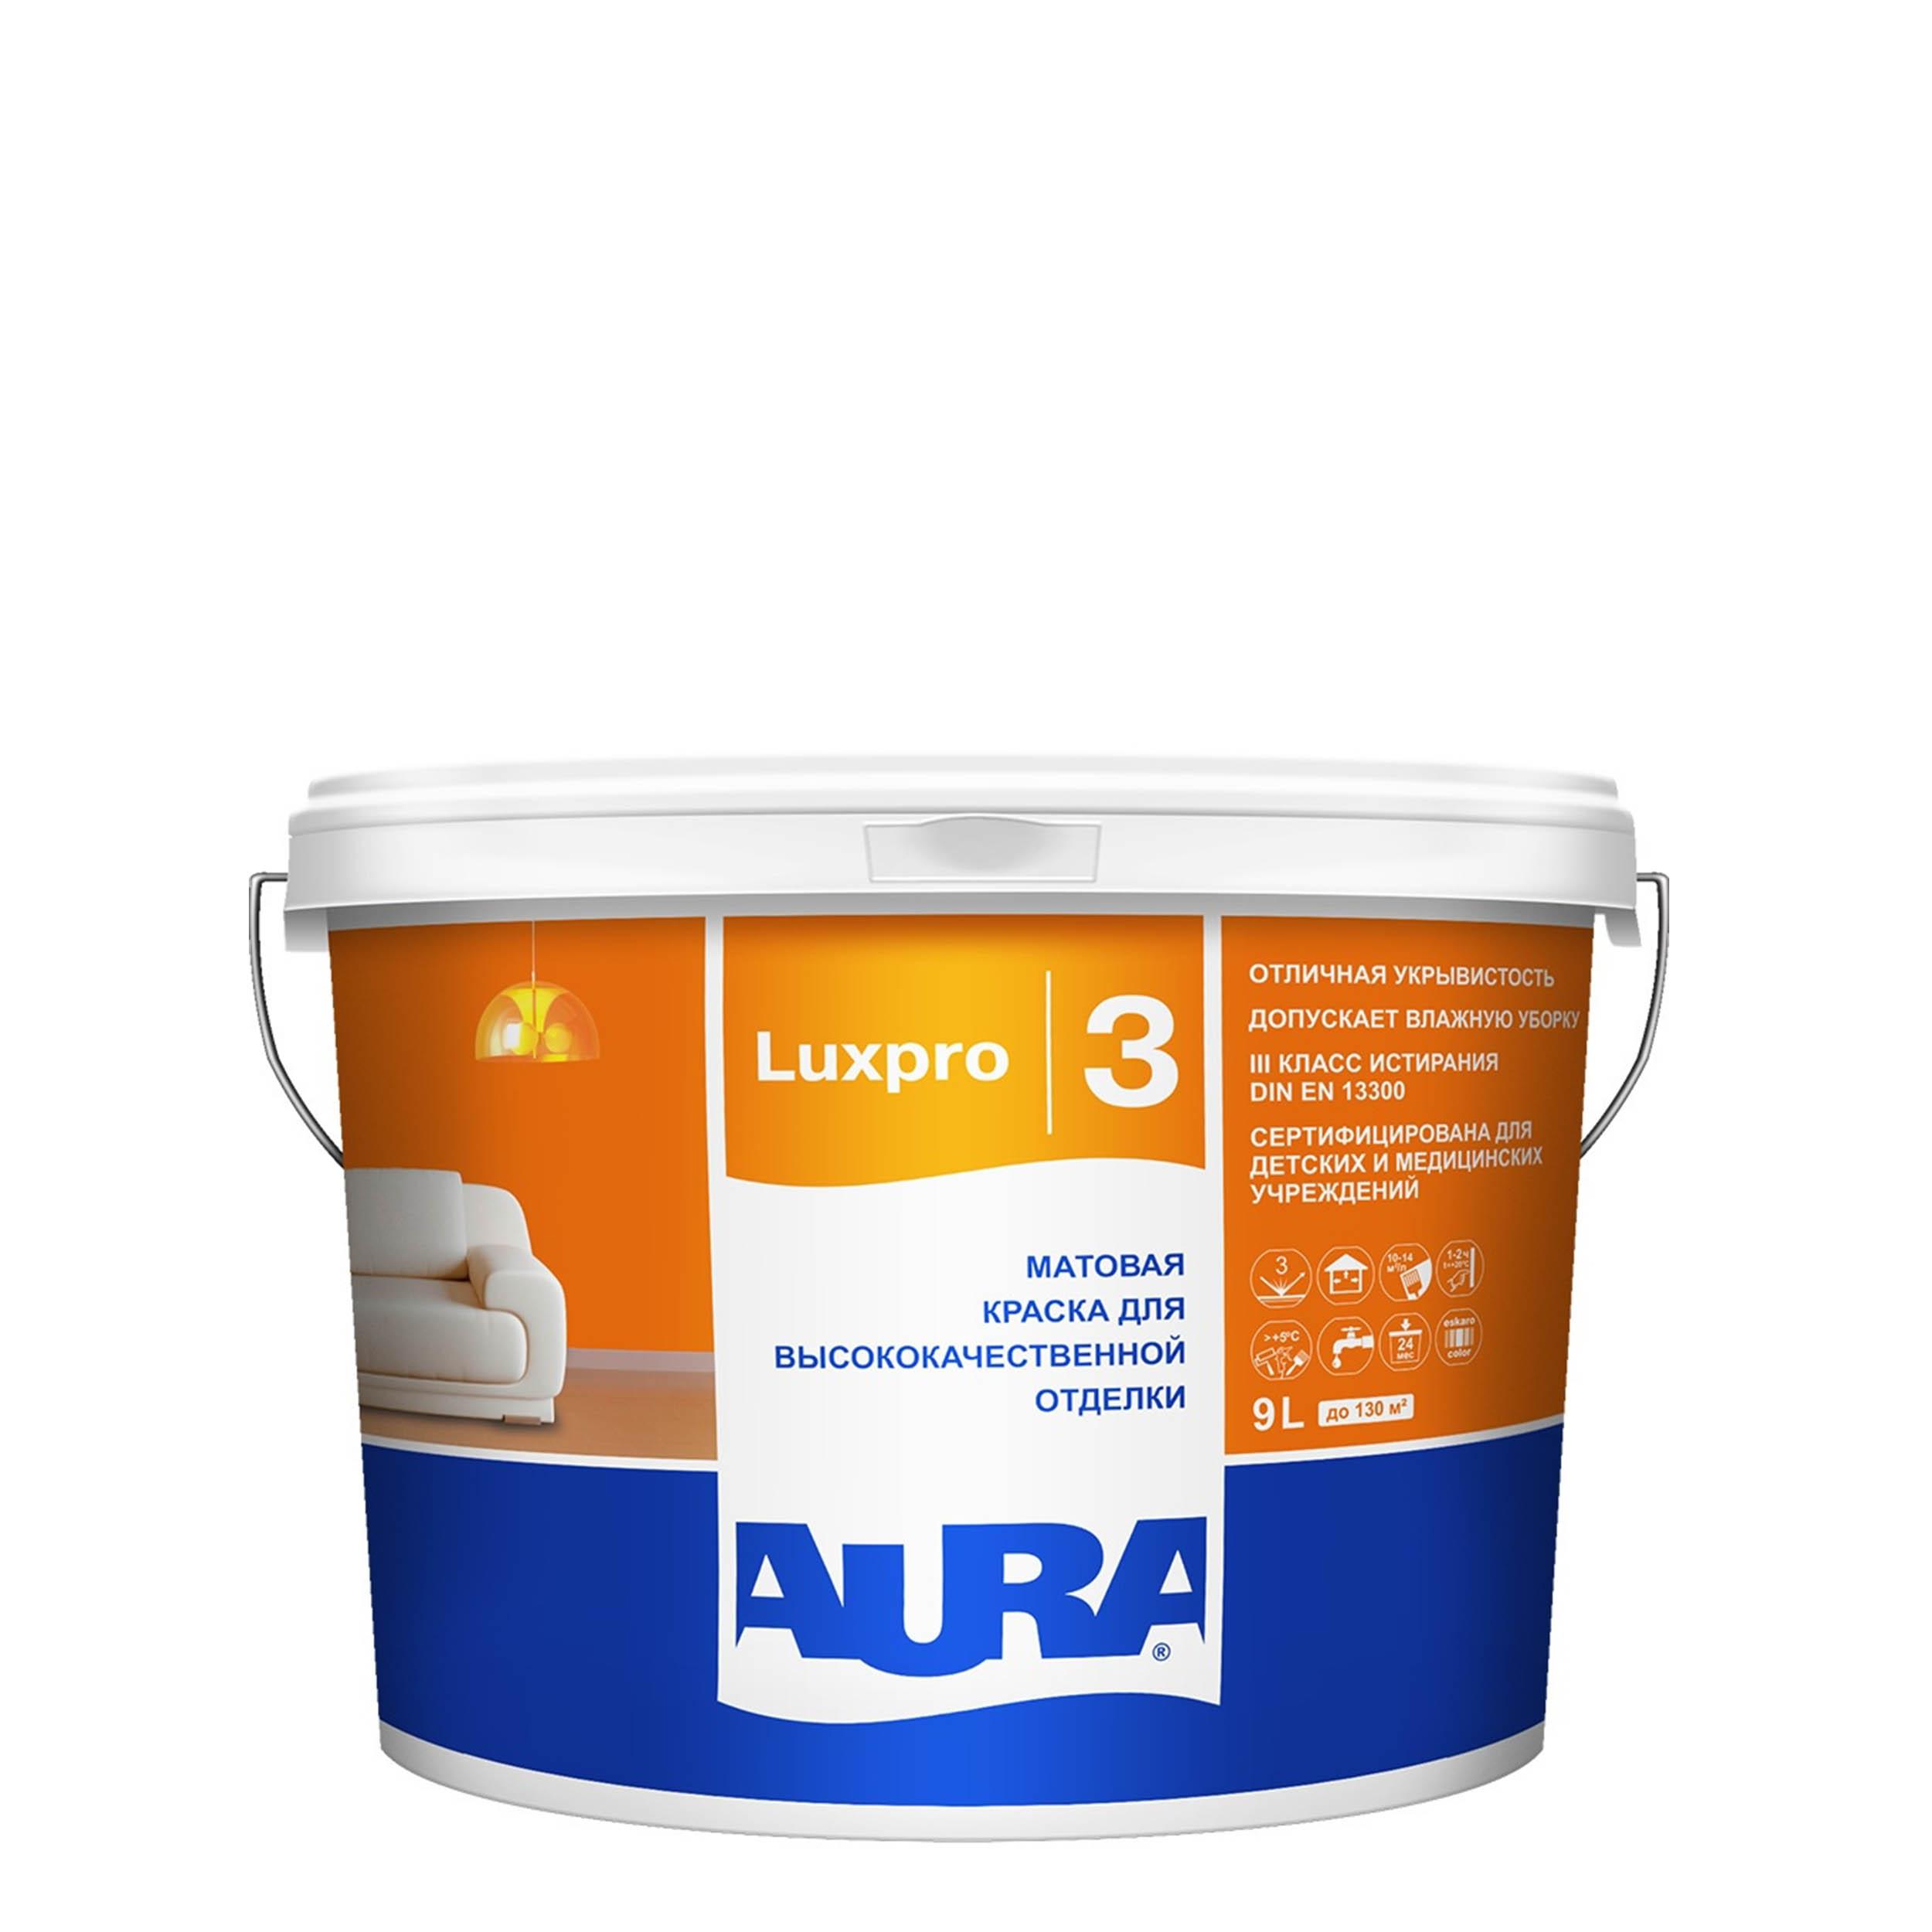 Фото 4 - Краска интерьерная, Aura LuxPRO 3, RAL 6005, 11 кг.